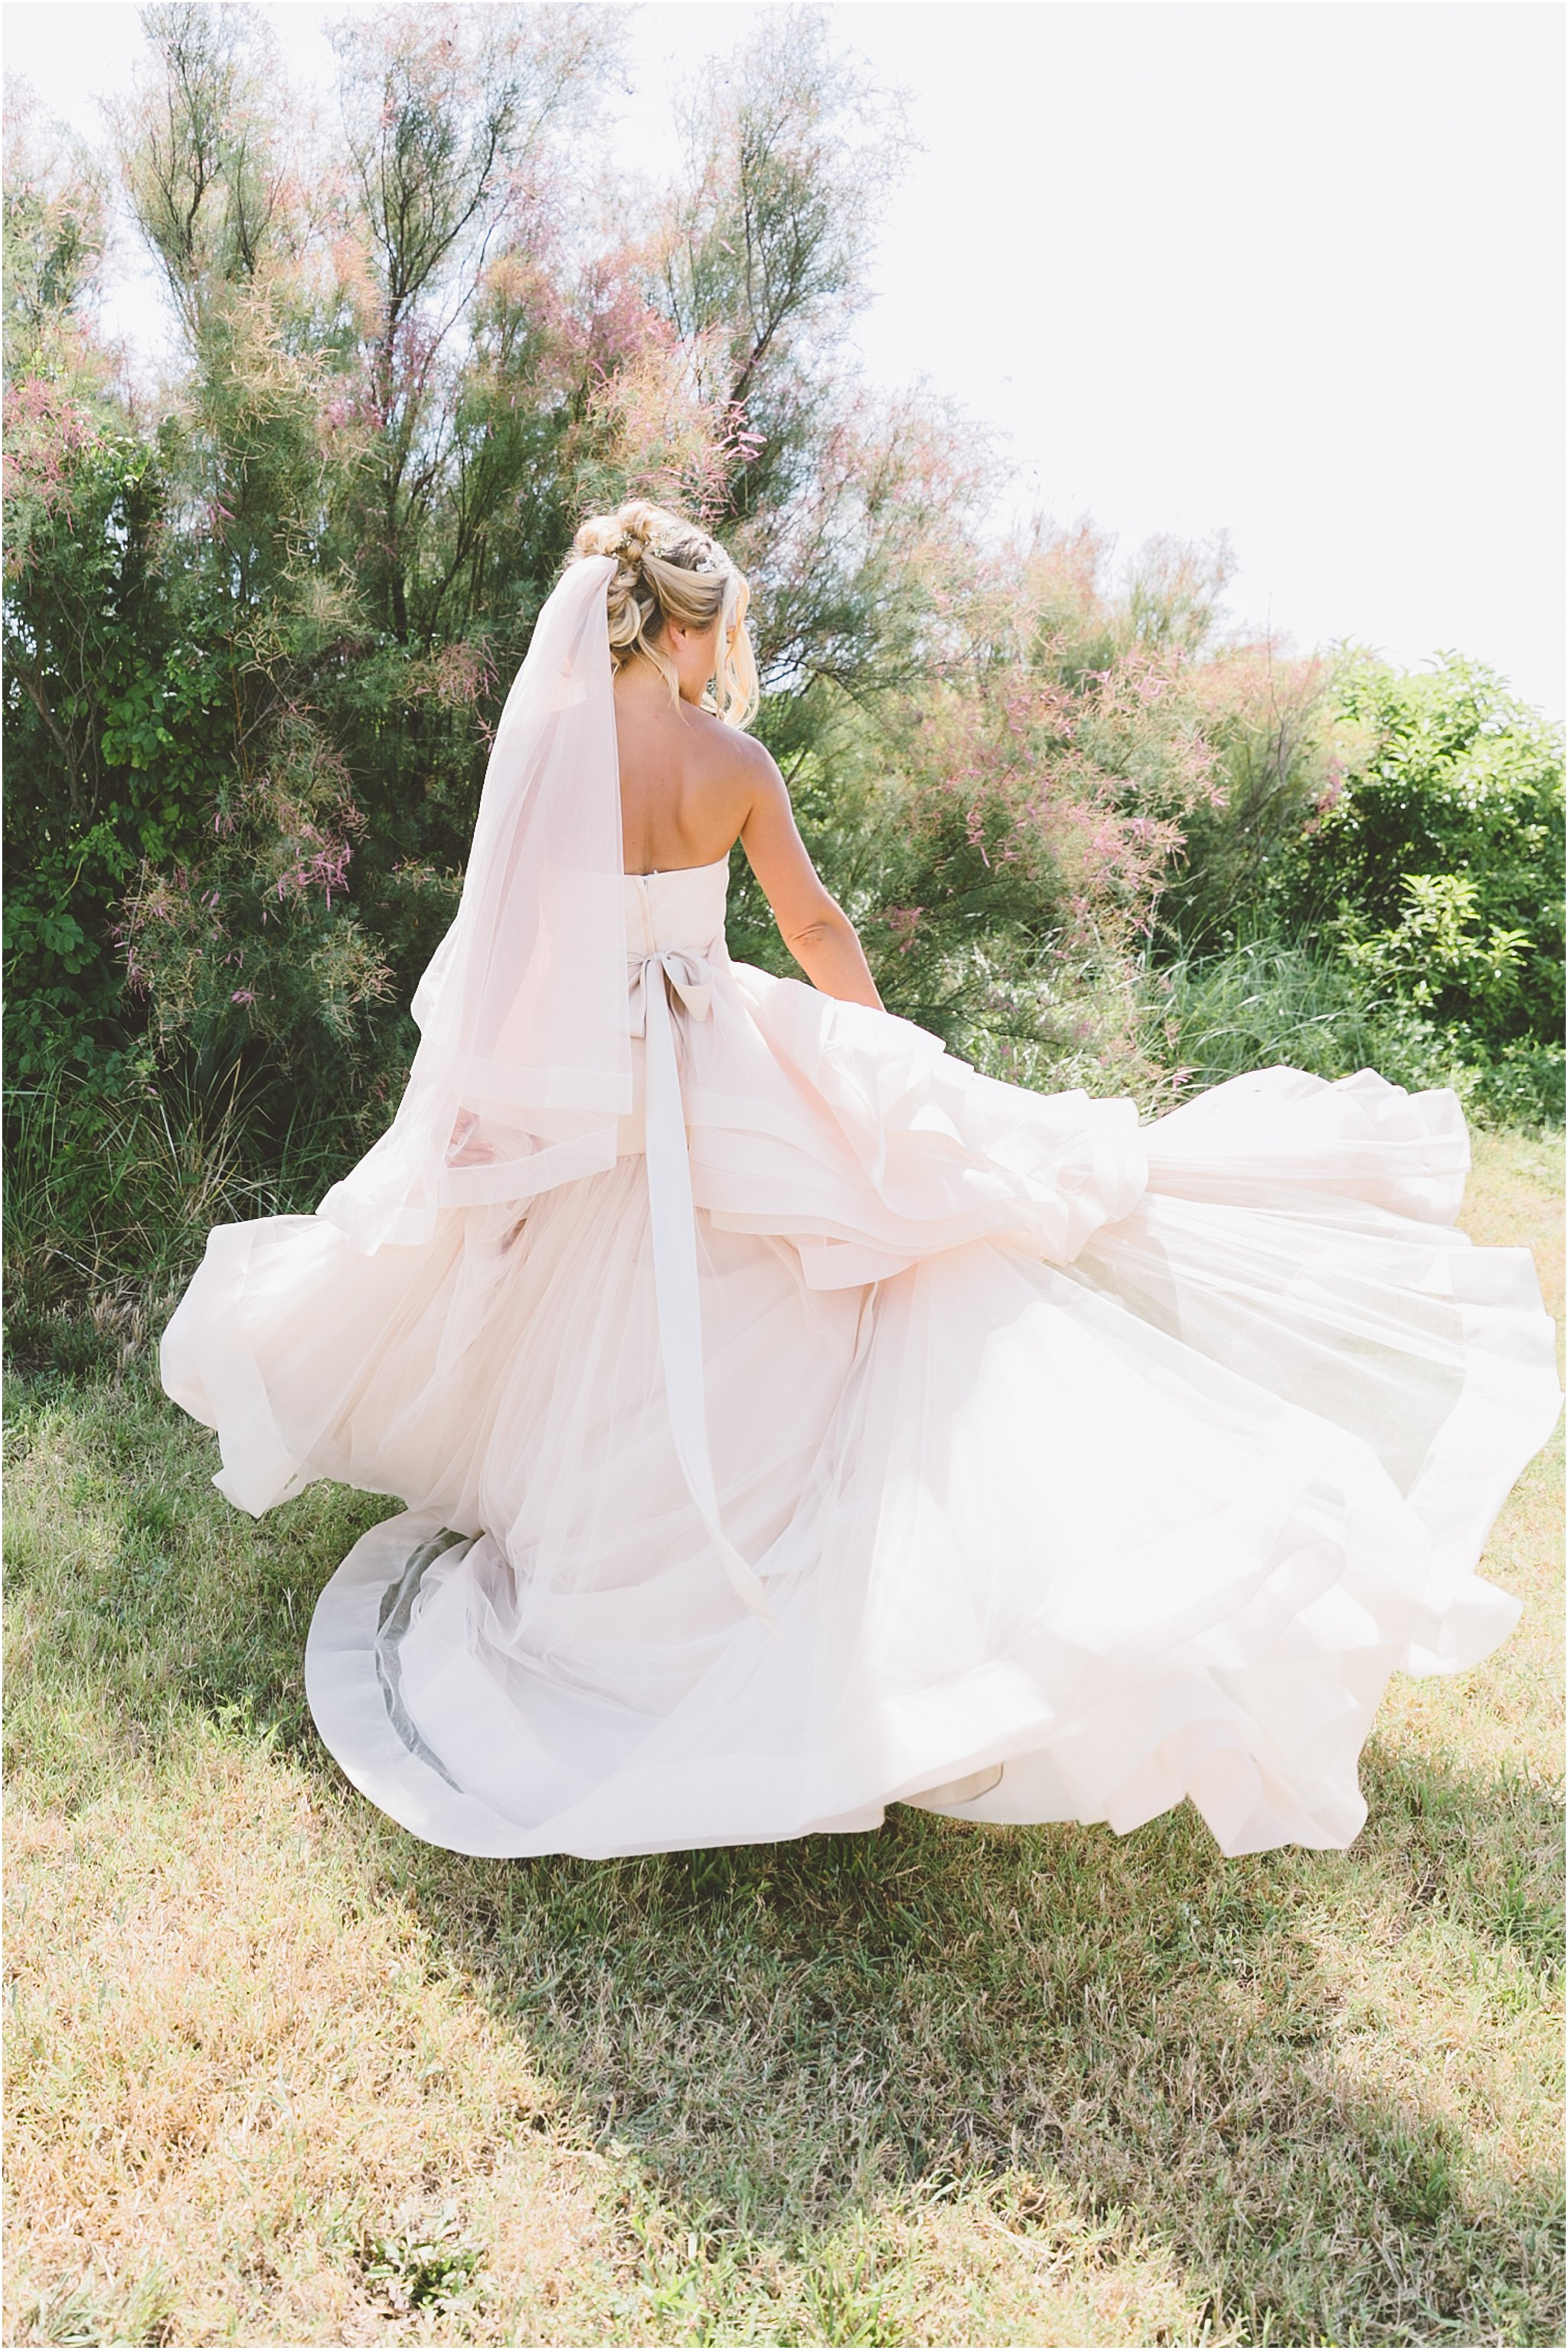 jessica_ryan_photography_virginia_beach_water_tabe_wedding_vera_wang_wedding_dress_0628